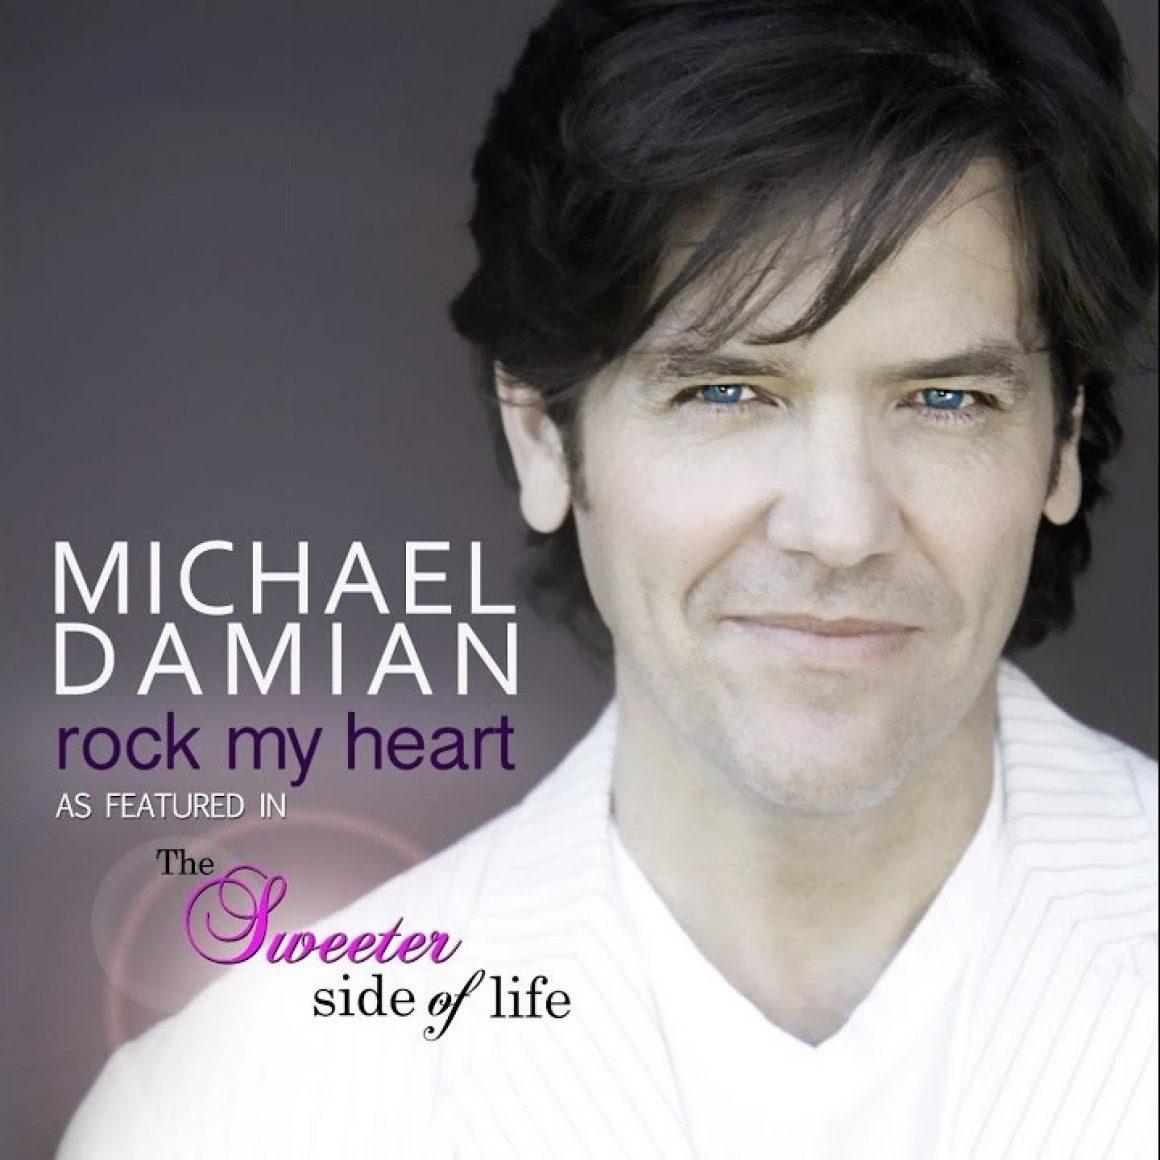 Michael-Damian-rock-my-heart-2.jpg